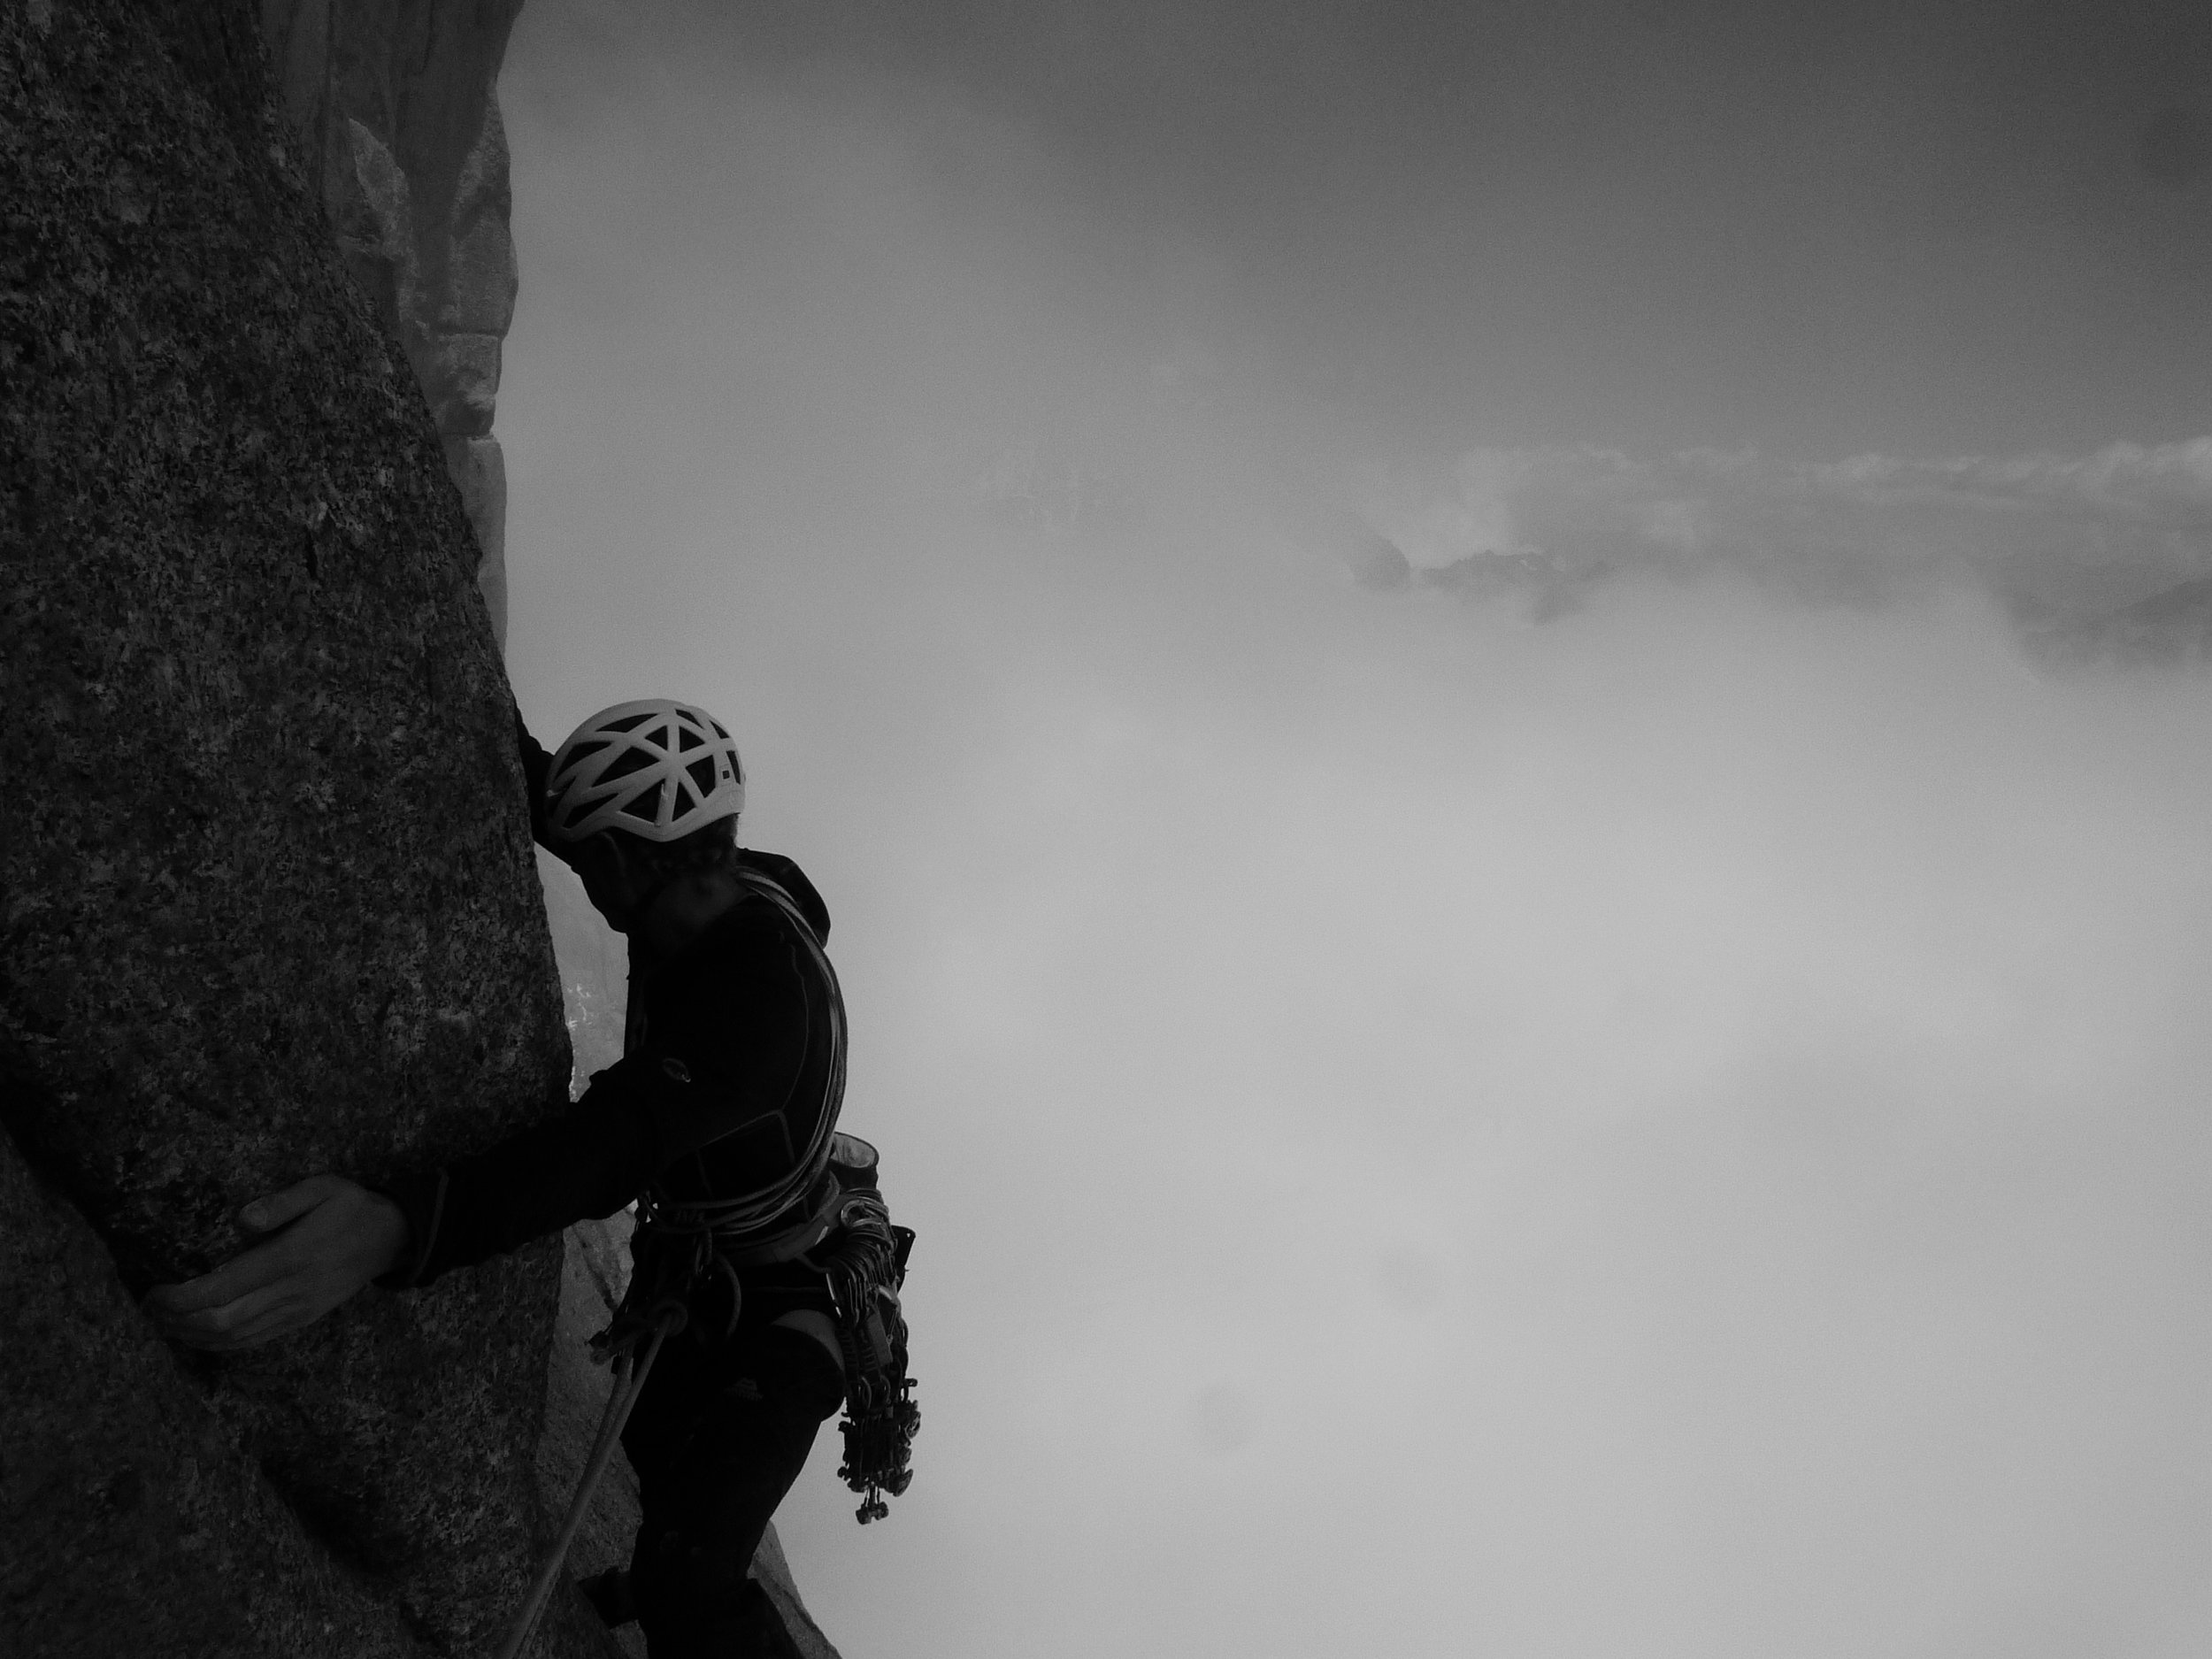 gulliver's travels, grand capucin, mont blanc massif. chamonix. photo: tony stone